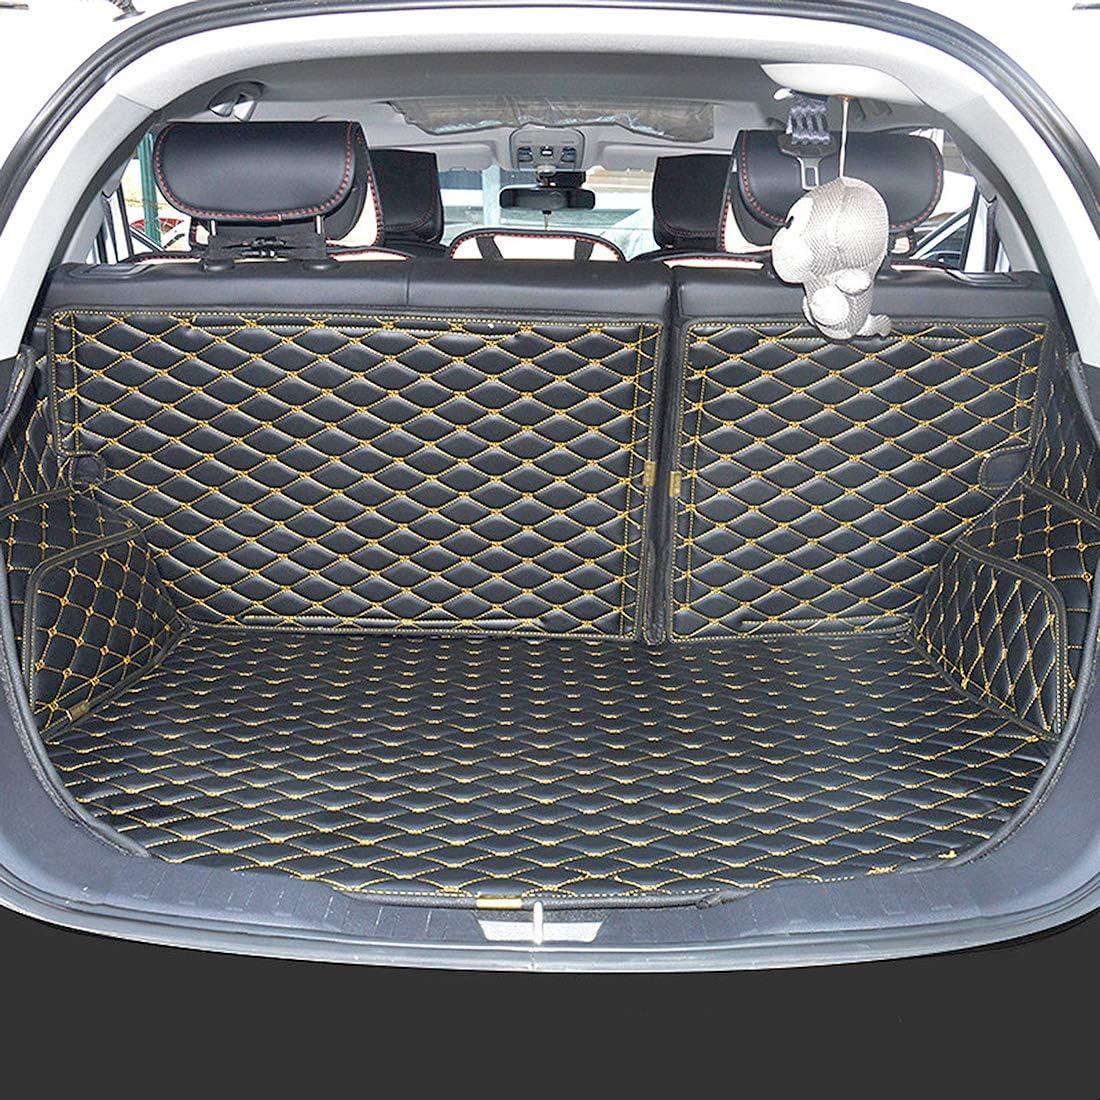 Orealtech Kofferraummatte Auto Für Mercedes Benz Klasse E W212 W213 A207 C207 C238 S212 S213 2011 2016 Allwetter Xpe Leder Kofferraumwanne 3d All Inclusive Stil Schmutzfangmatte Auto